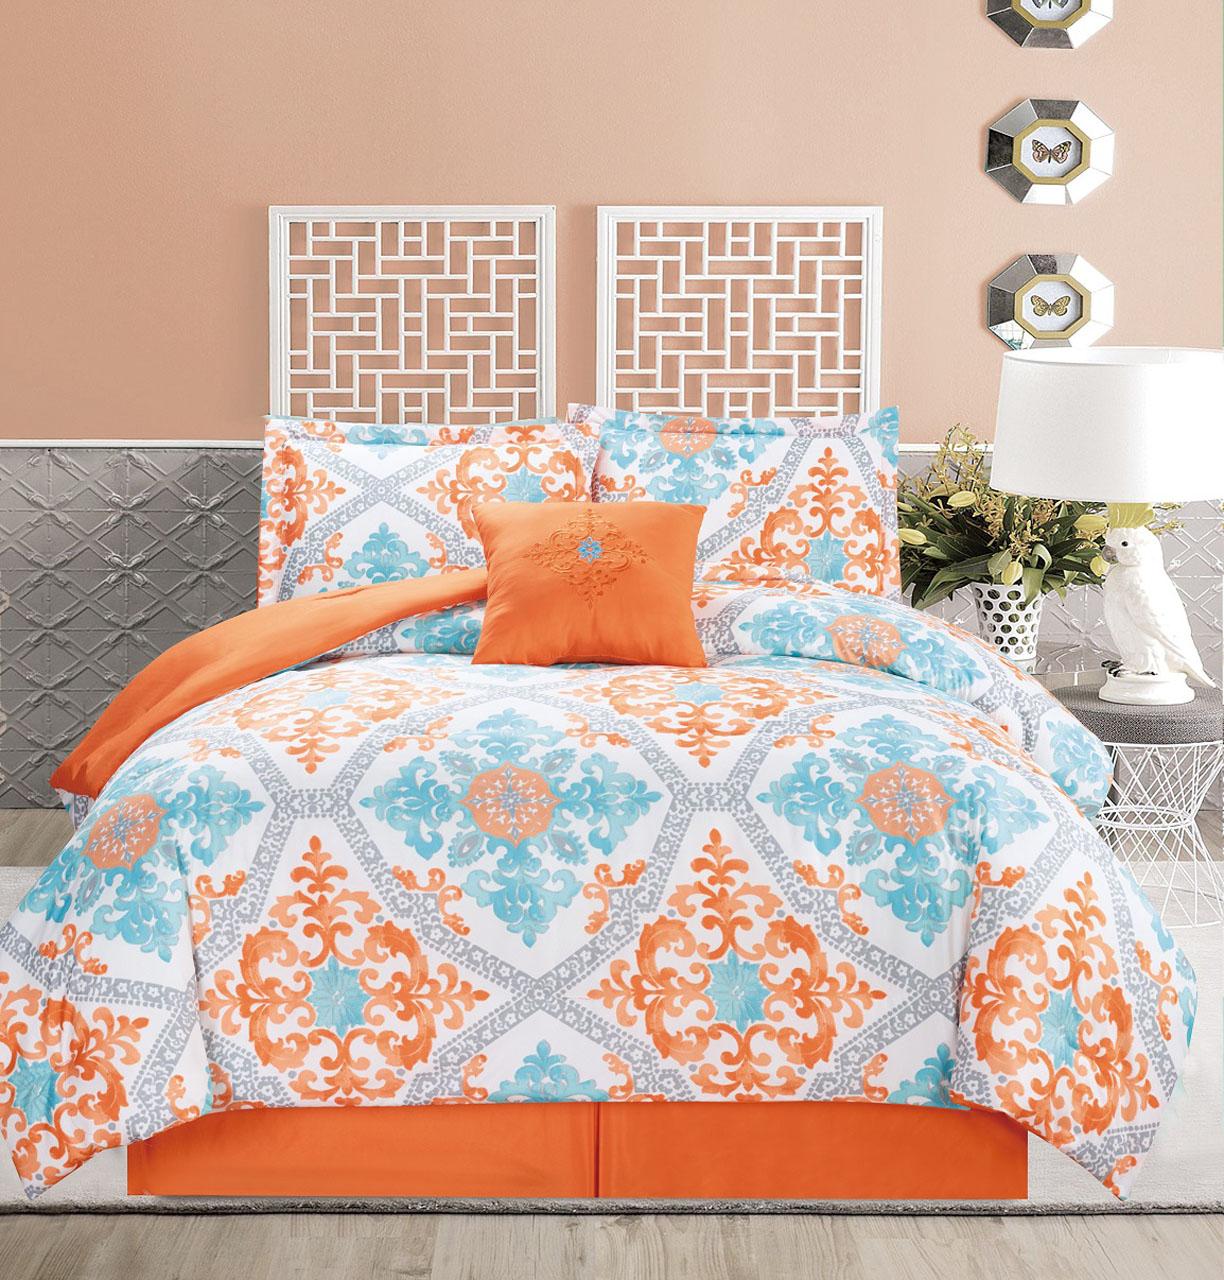 5 piece regal orange blue white comforter set ebay - Orange and blue comforter ...